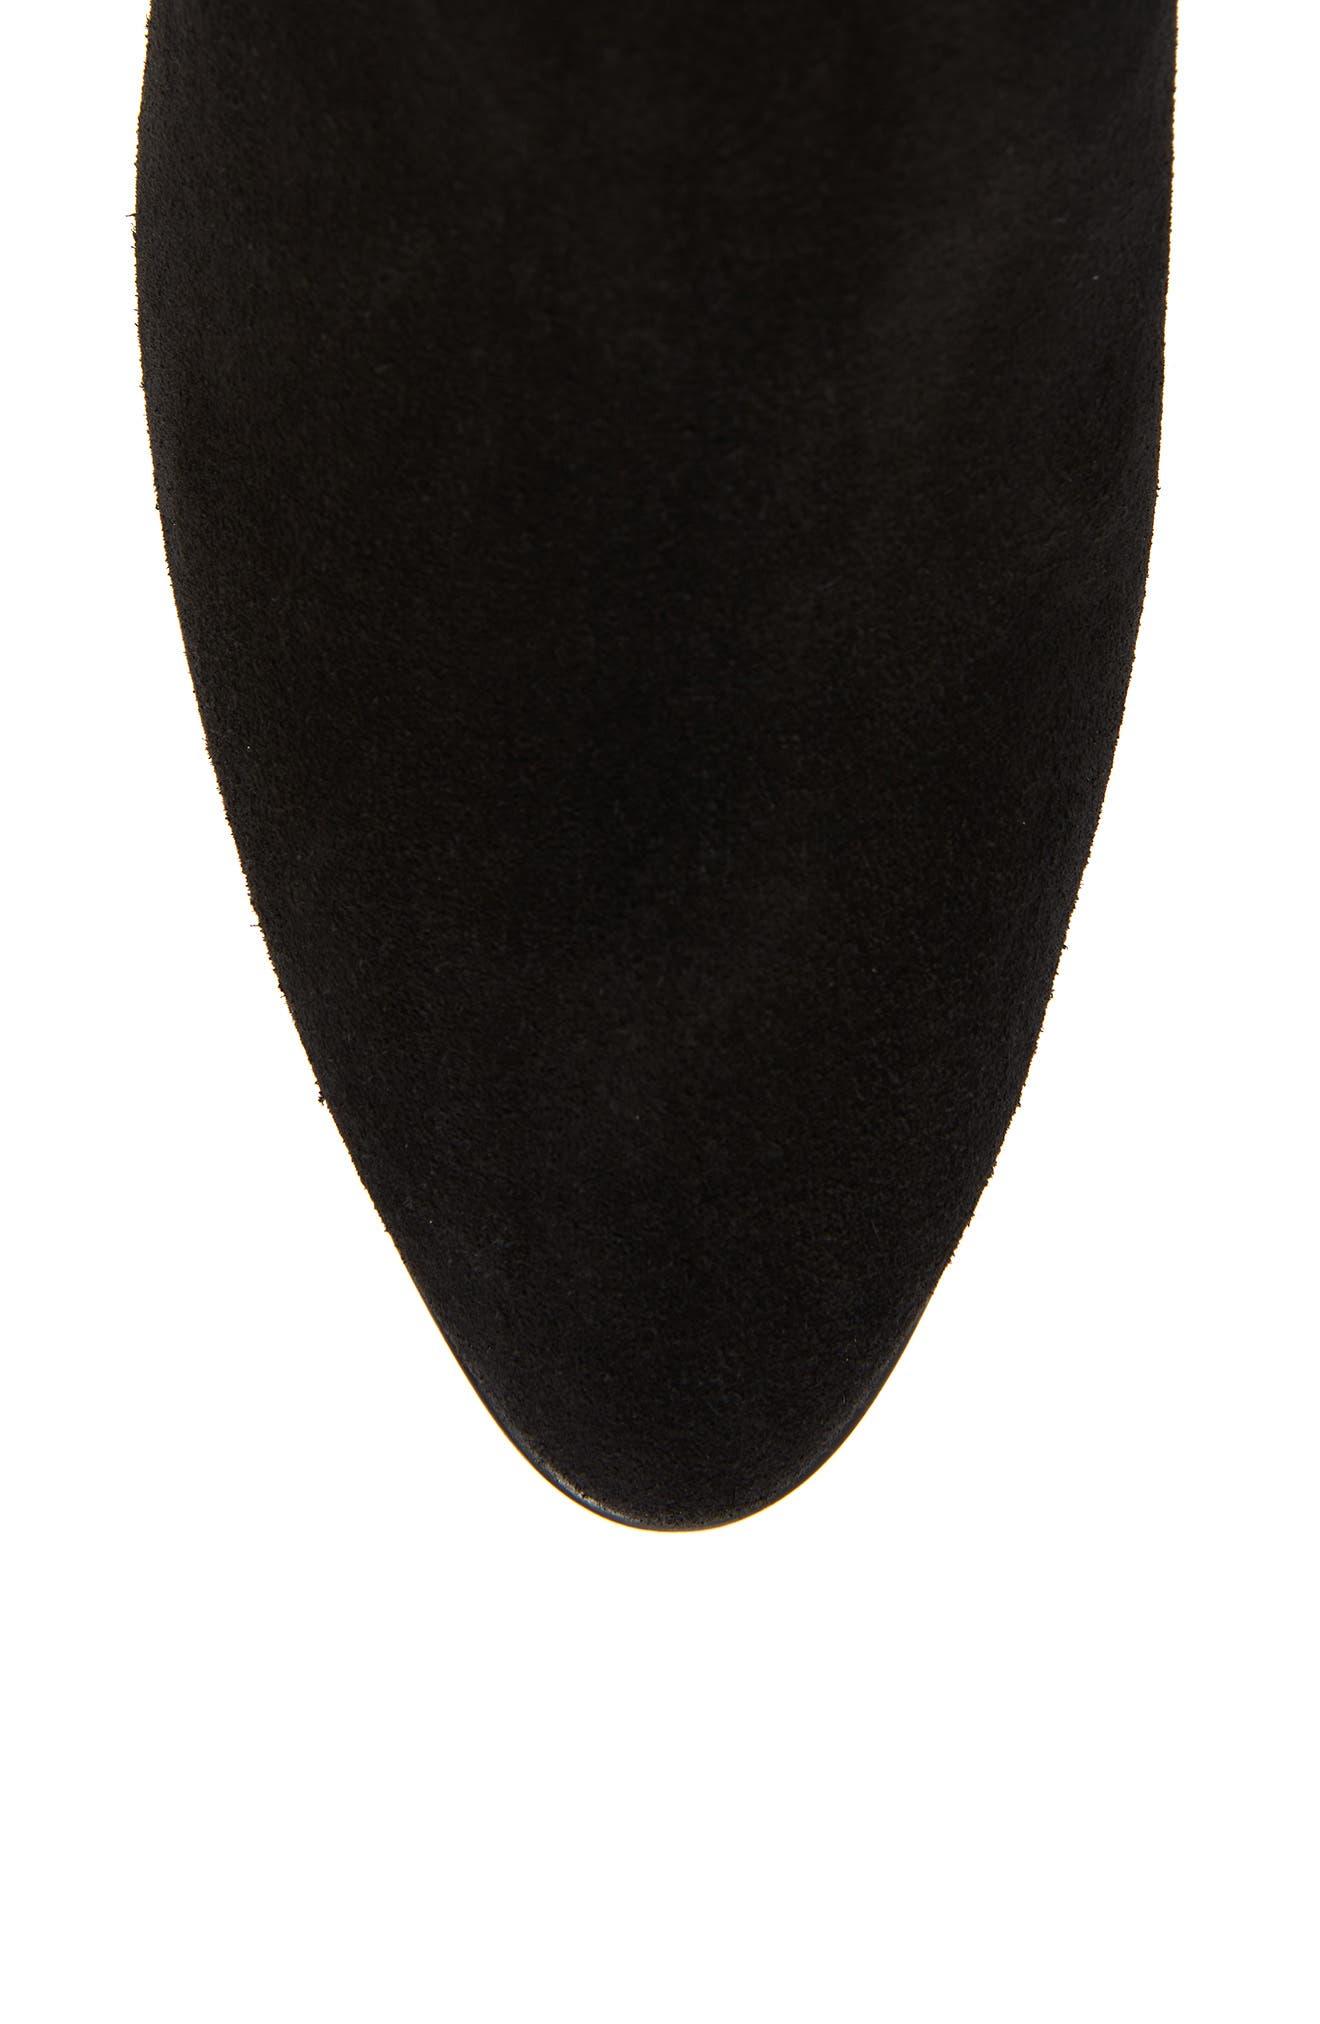 AQUATALIA, Dahliana Weatherproof Knee High Boot, Alternate thumbnail 5, color, BLACK